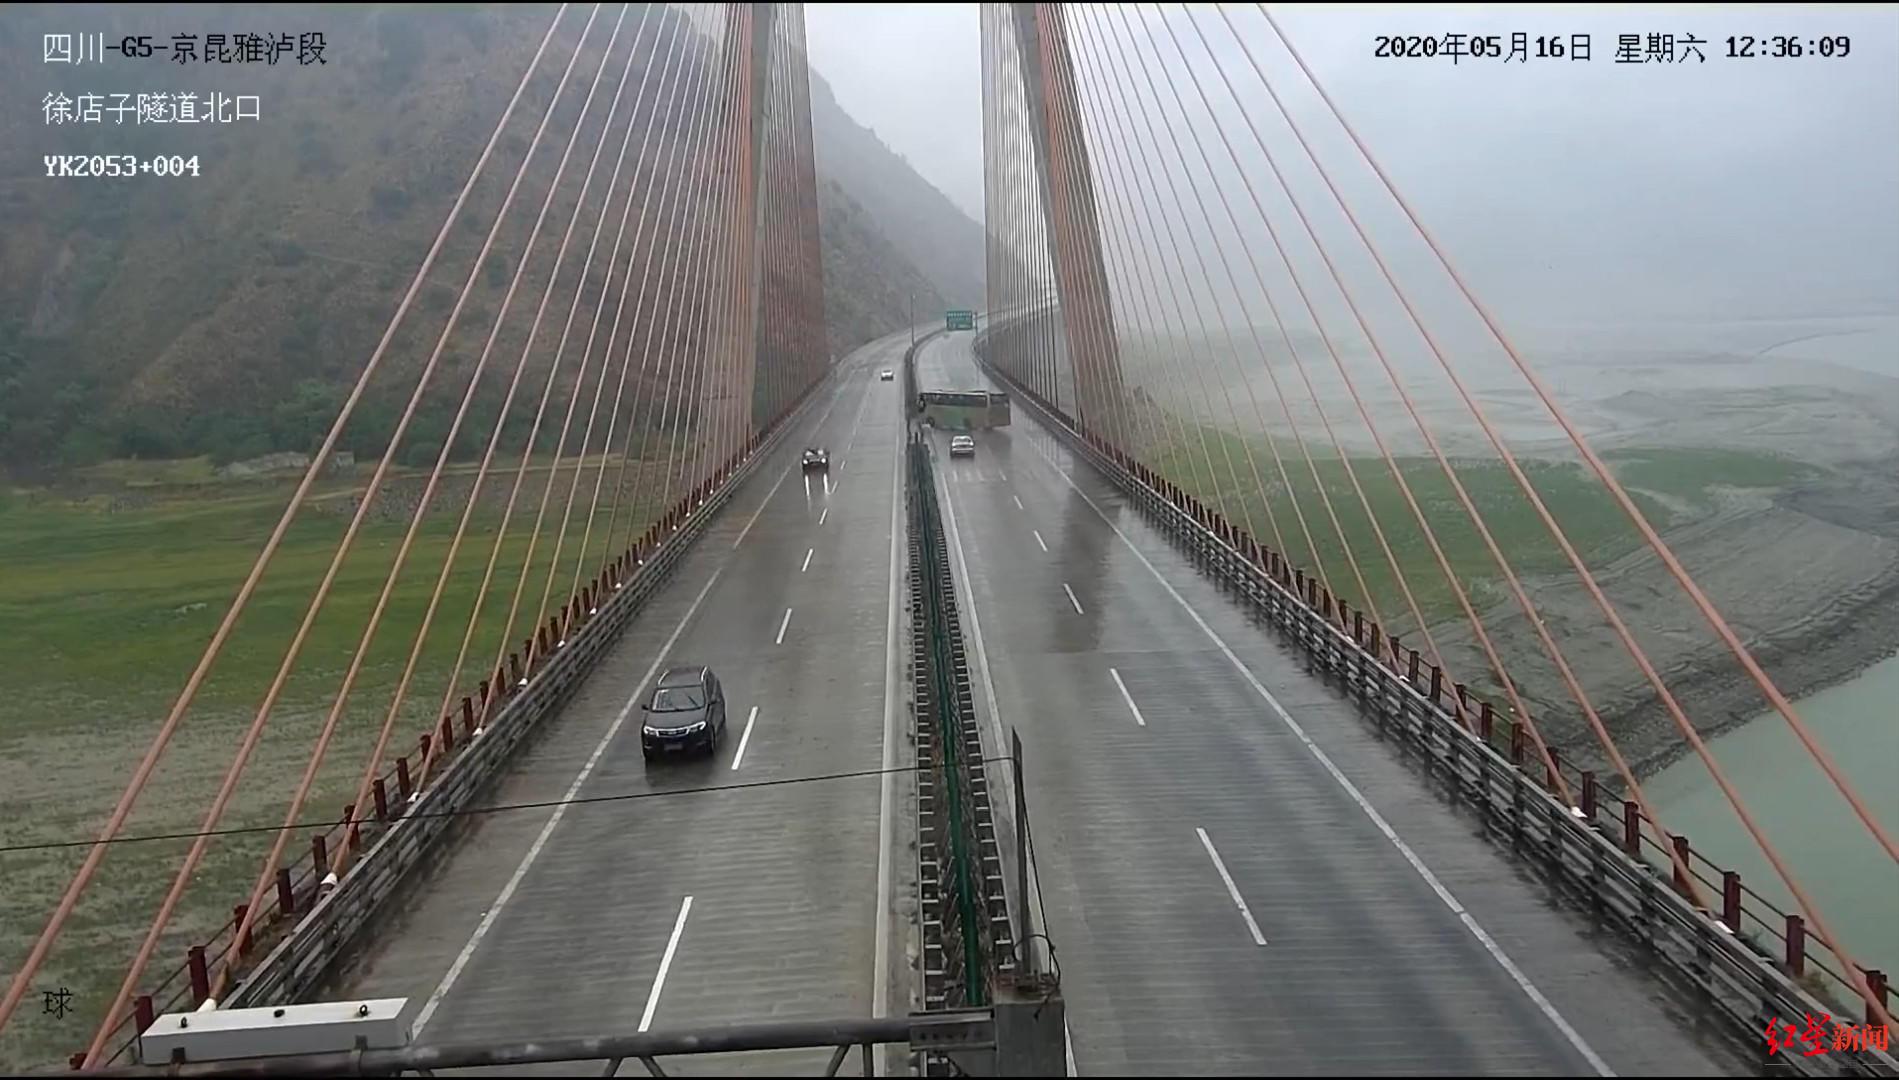 【mtgox破产】_四川雅西高速客车侧翻致6死29伤 司机获刑6年